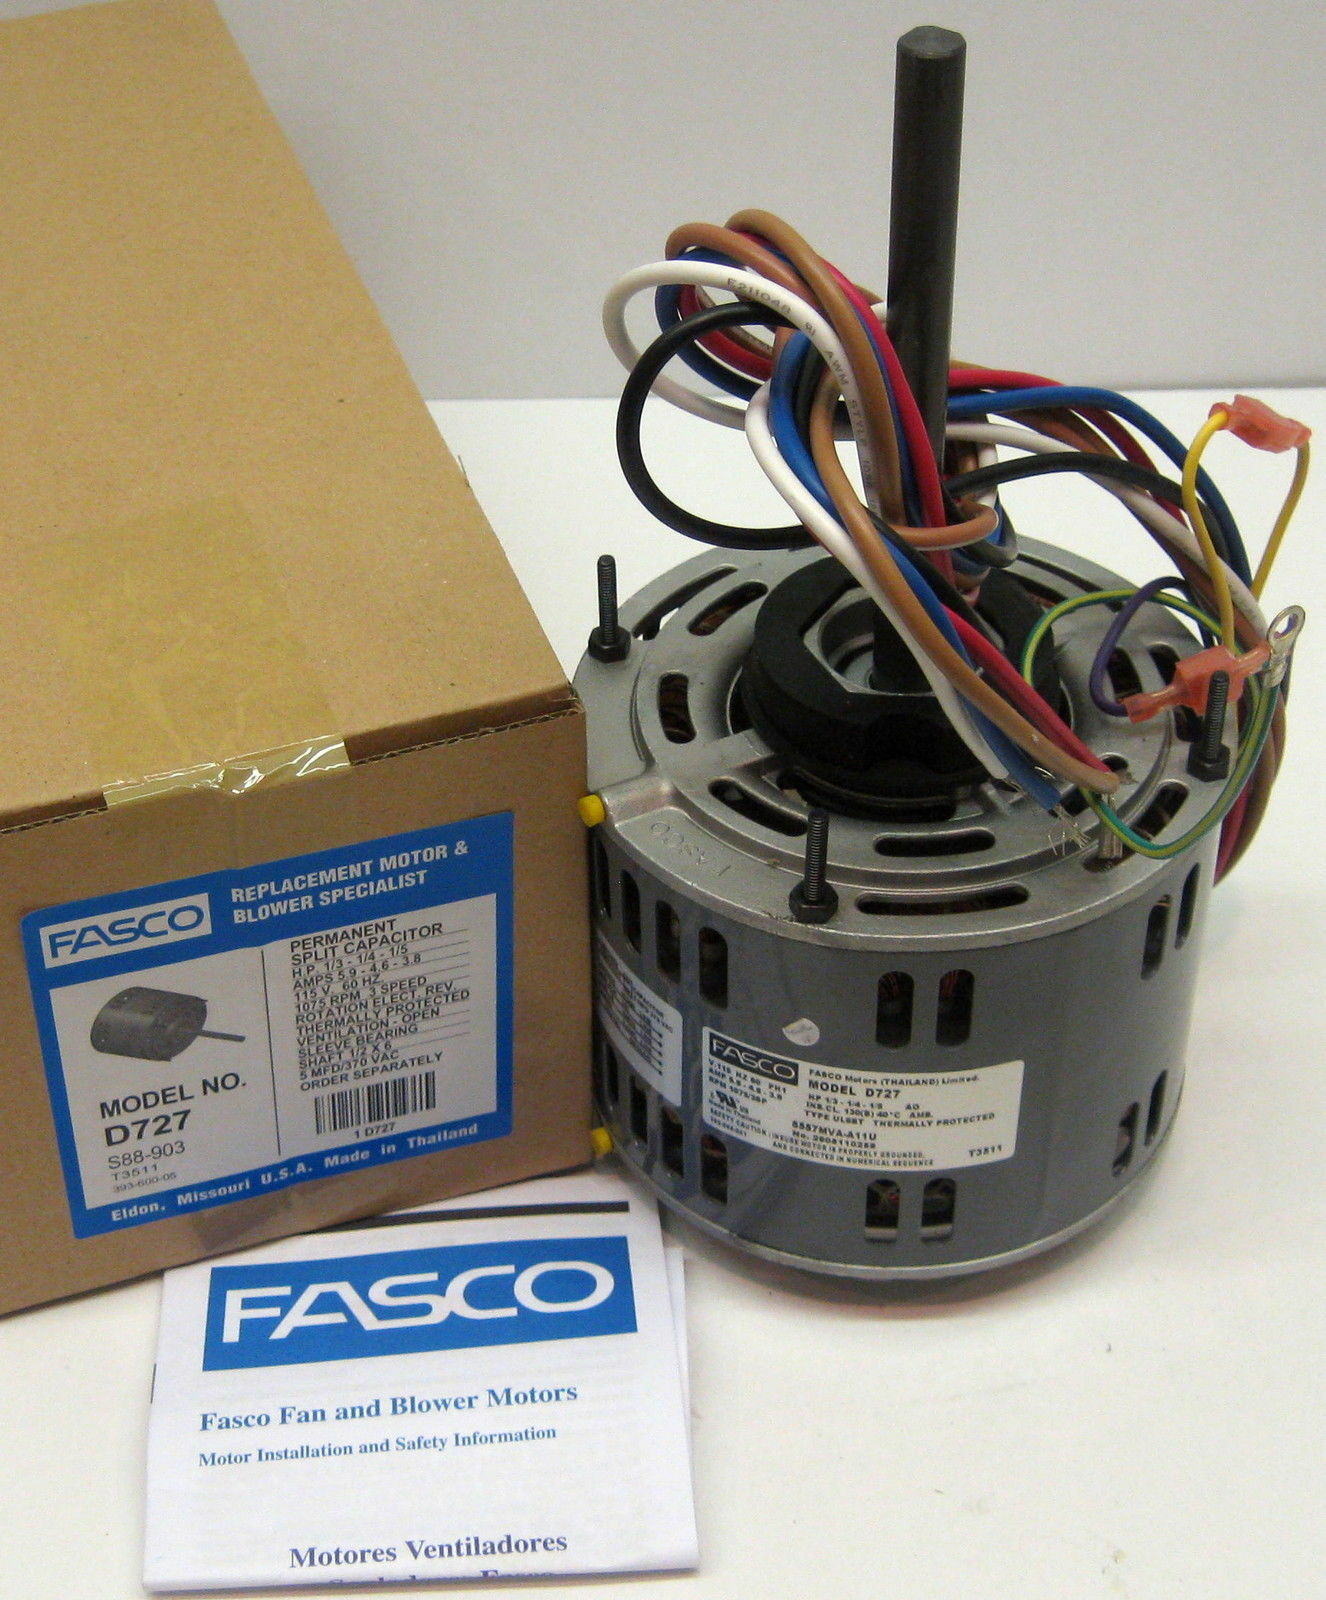 Fasco Fan Motor Wiring Diagram from i.ebayimg.com